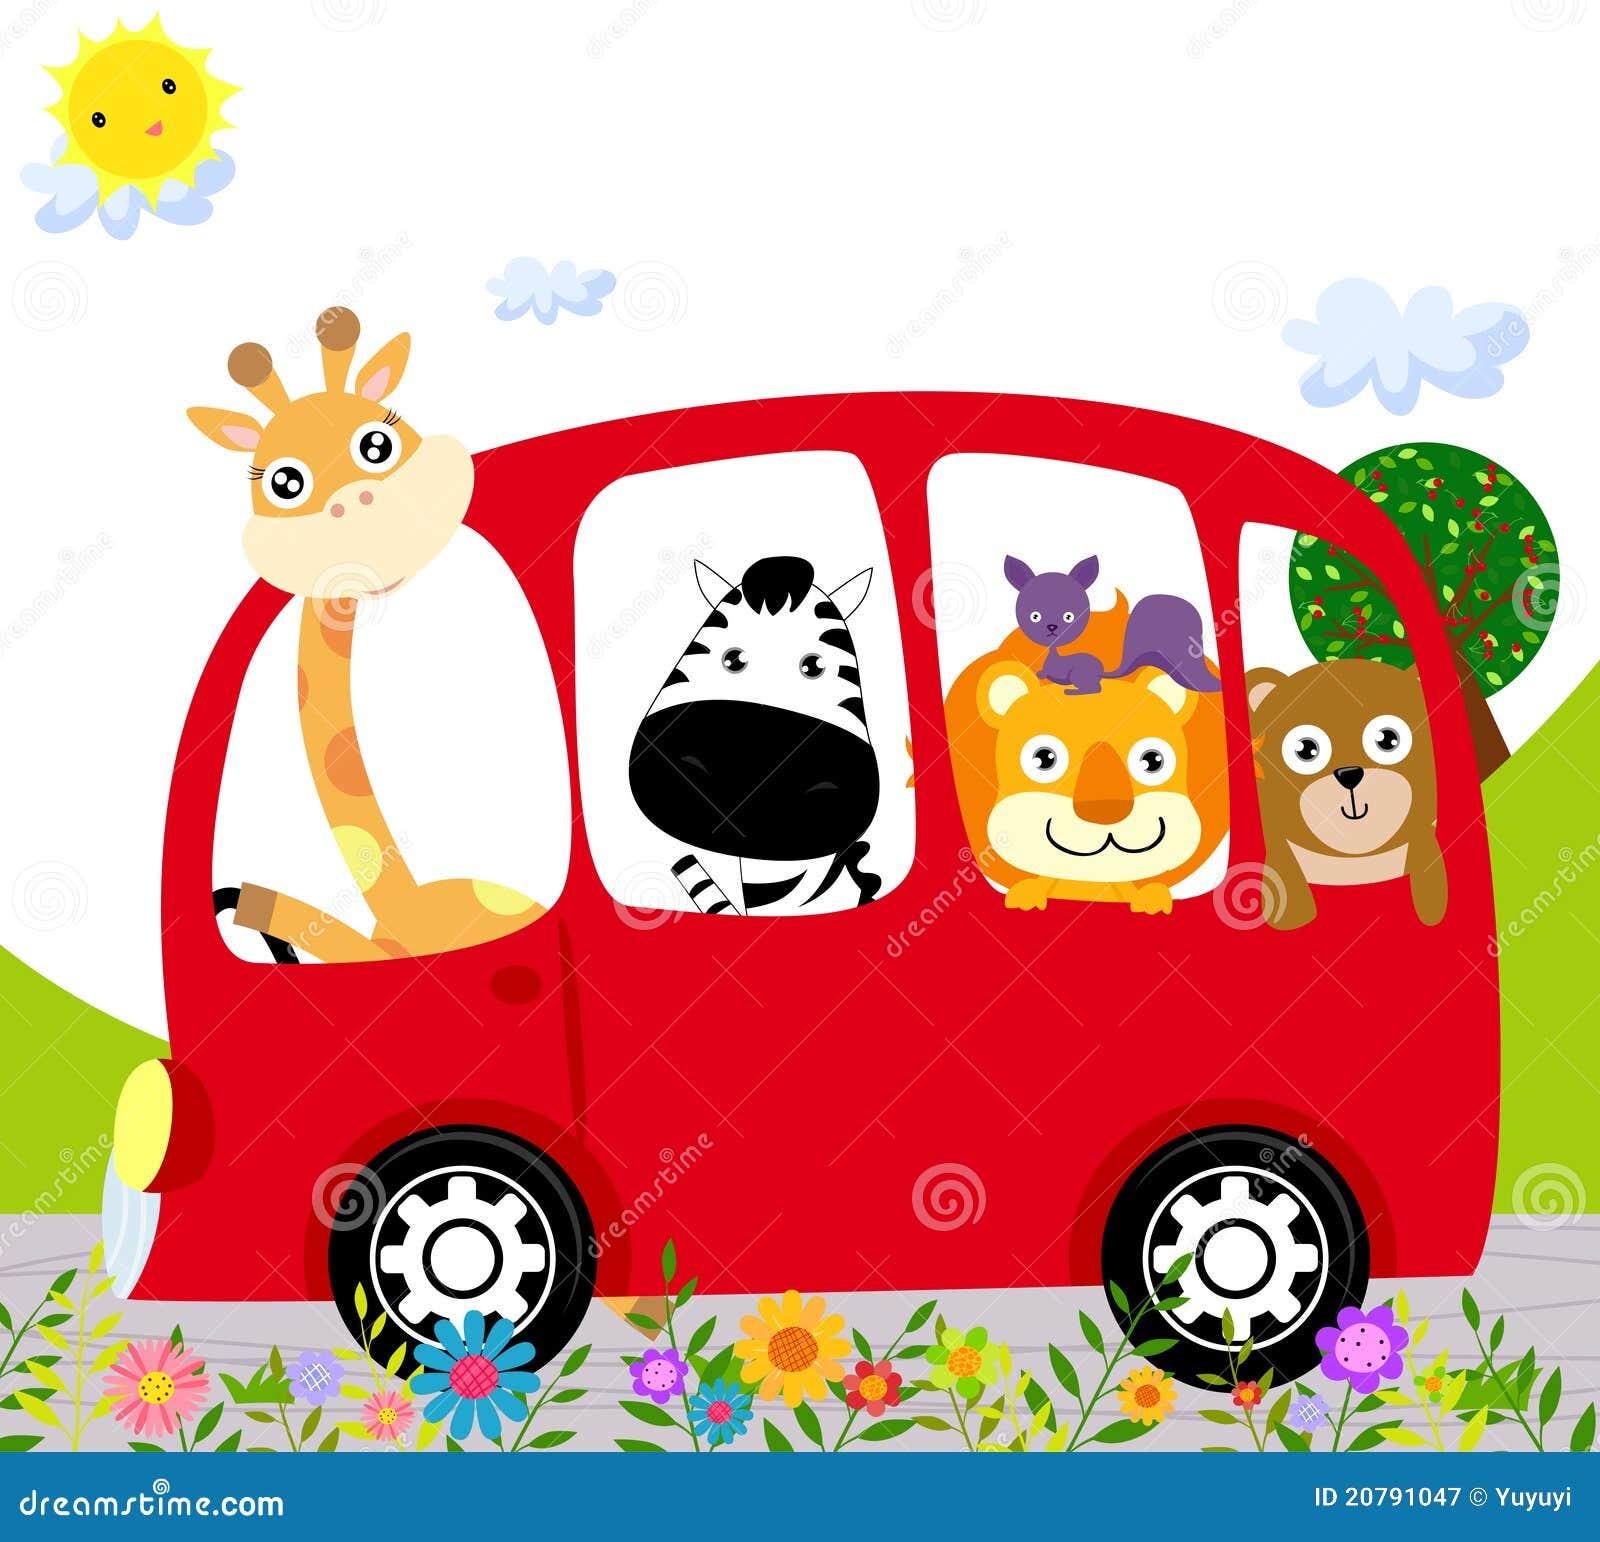 Animal Bus Royalty Free Stock Photography - Image: 20791047